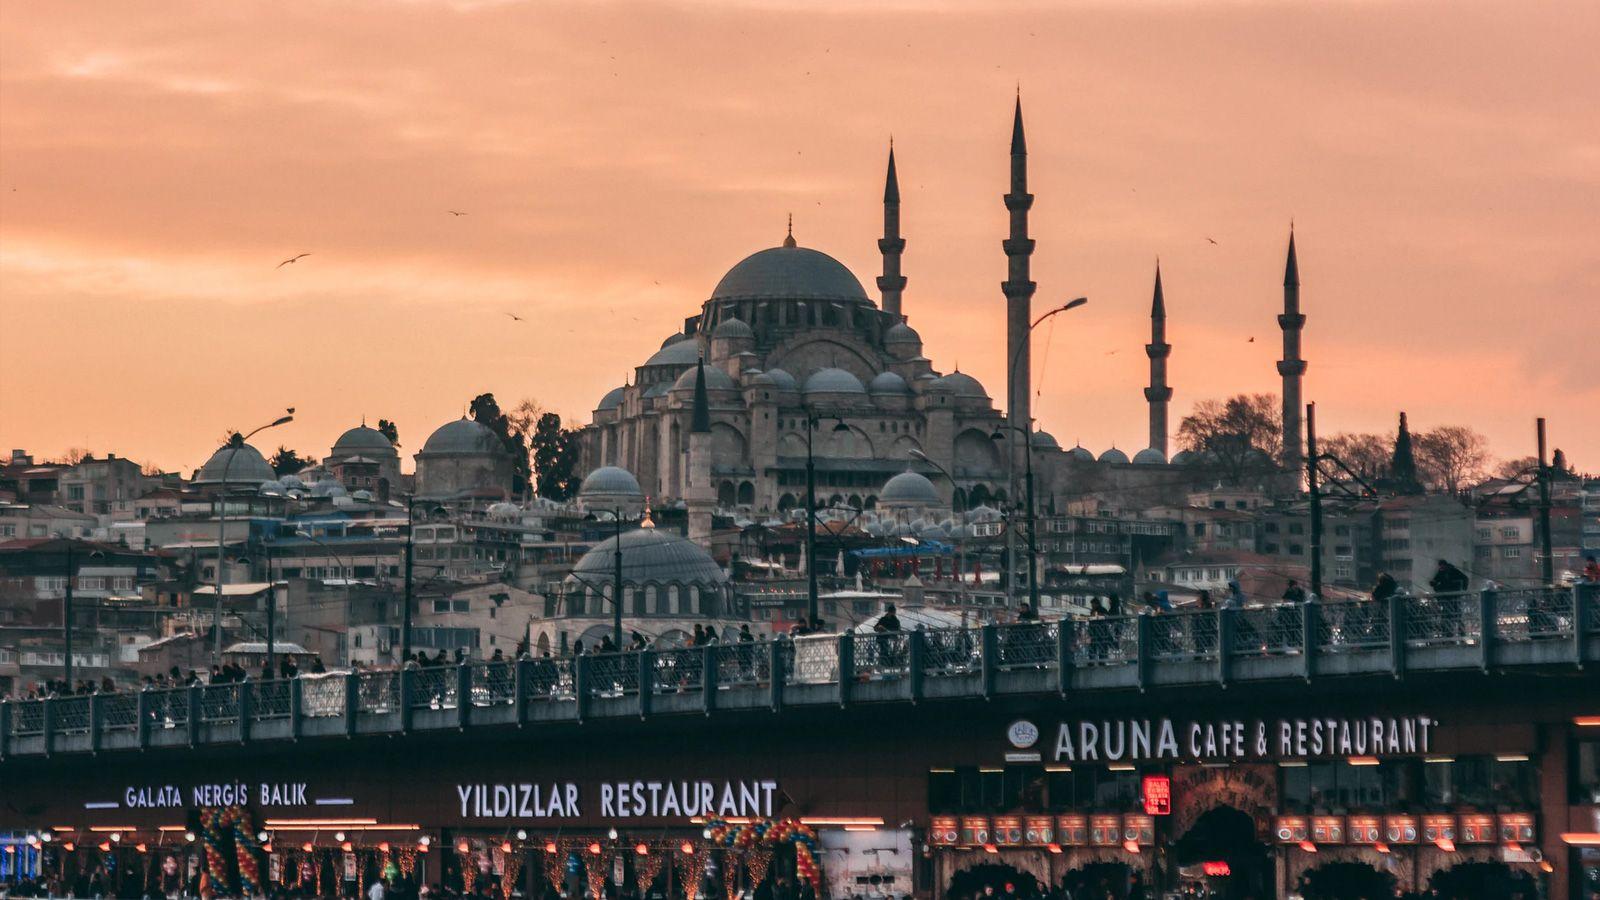 Szybki quiz o Stambule quiz